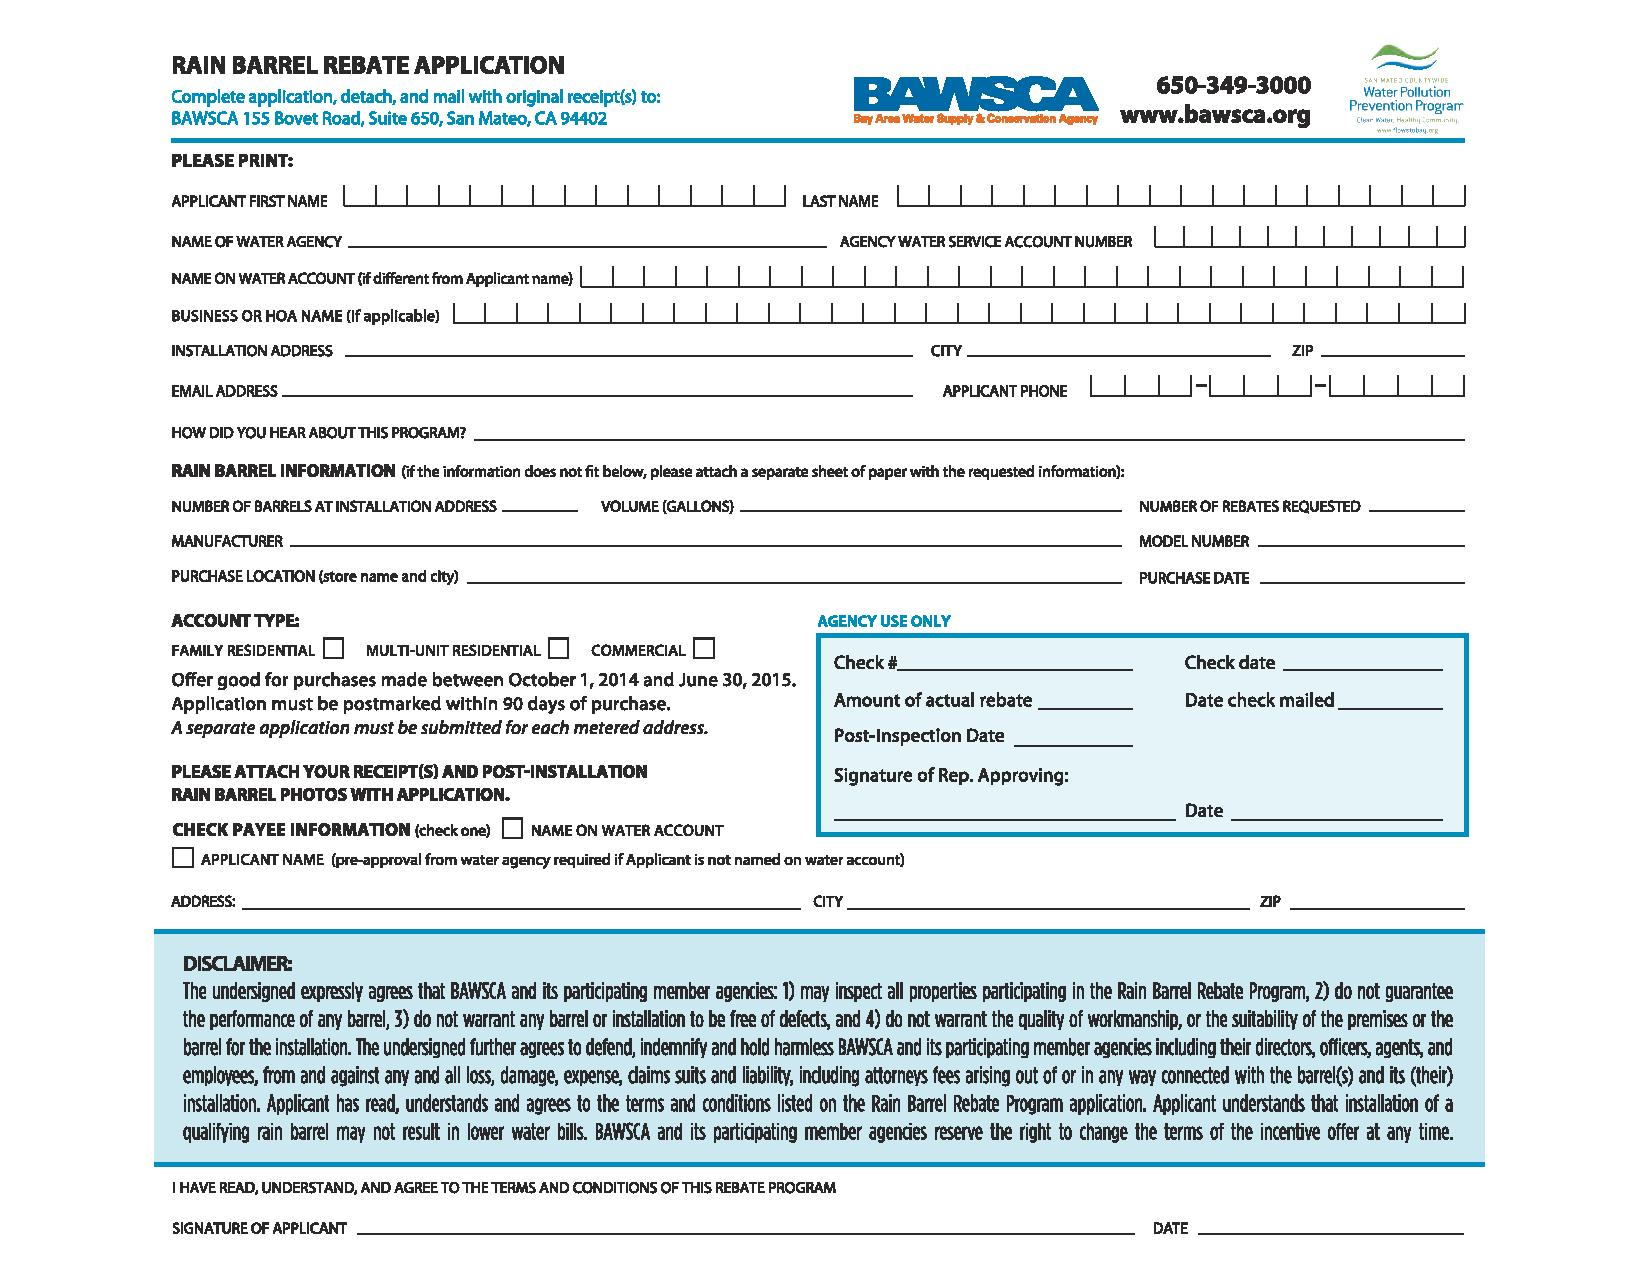 Rain Barrel Application Form FY 14-15 2-page-003